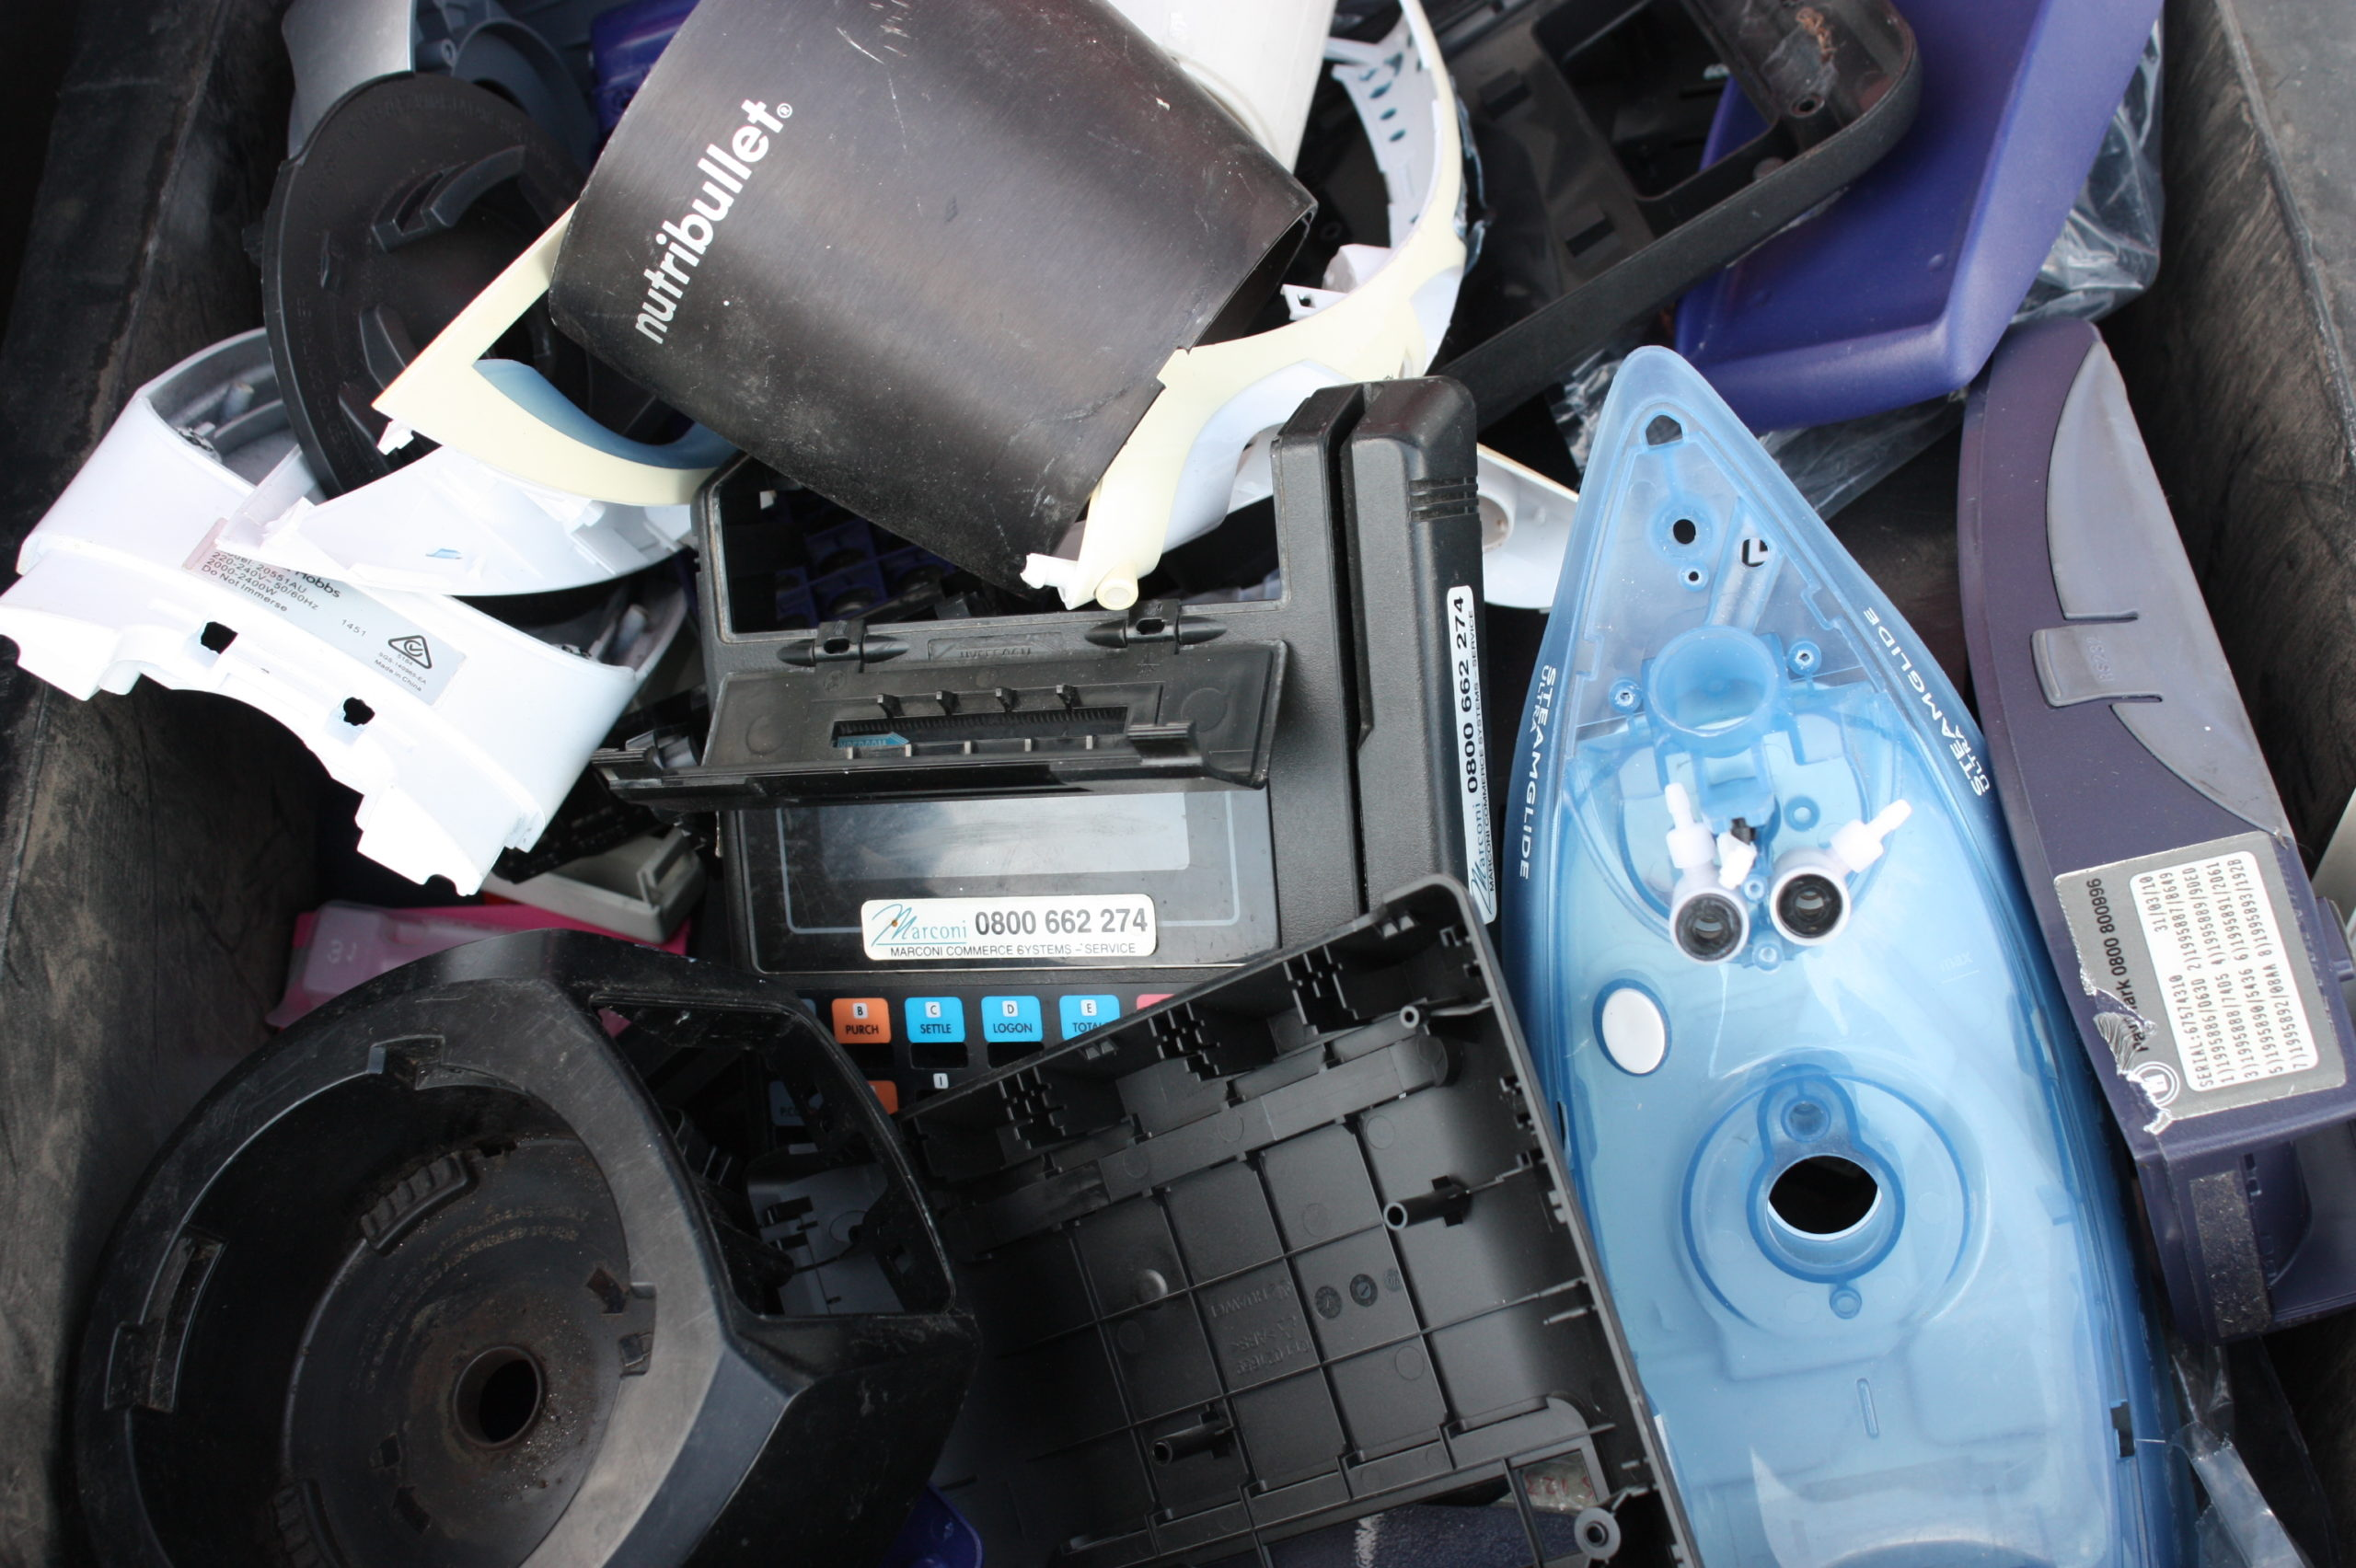 Assorted plastic parts